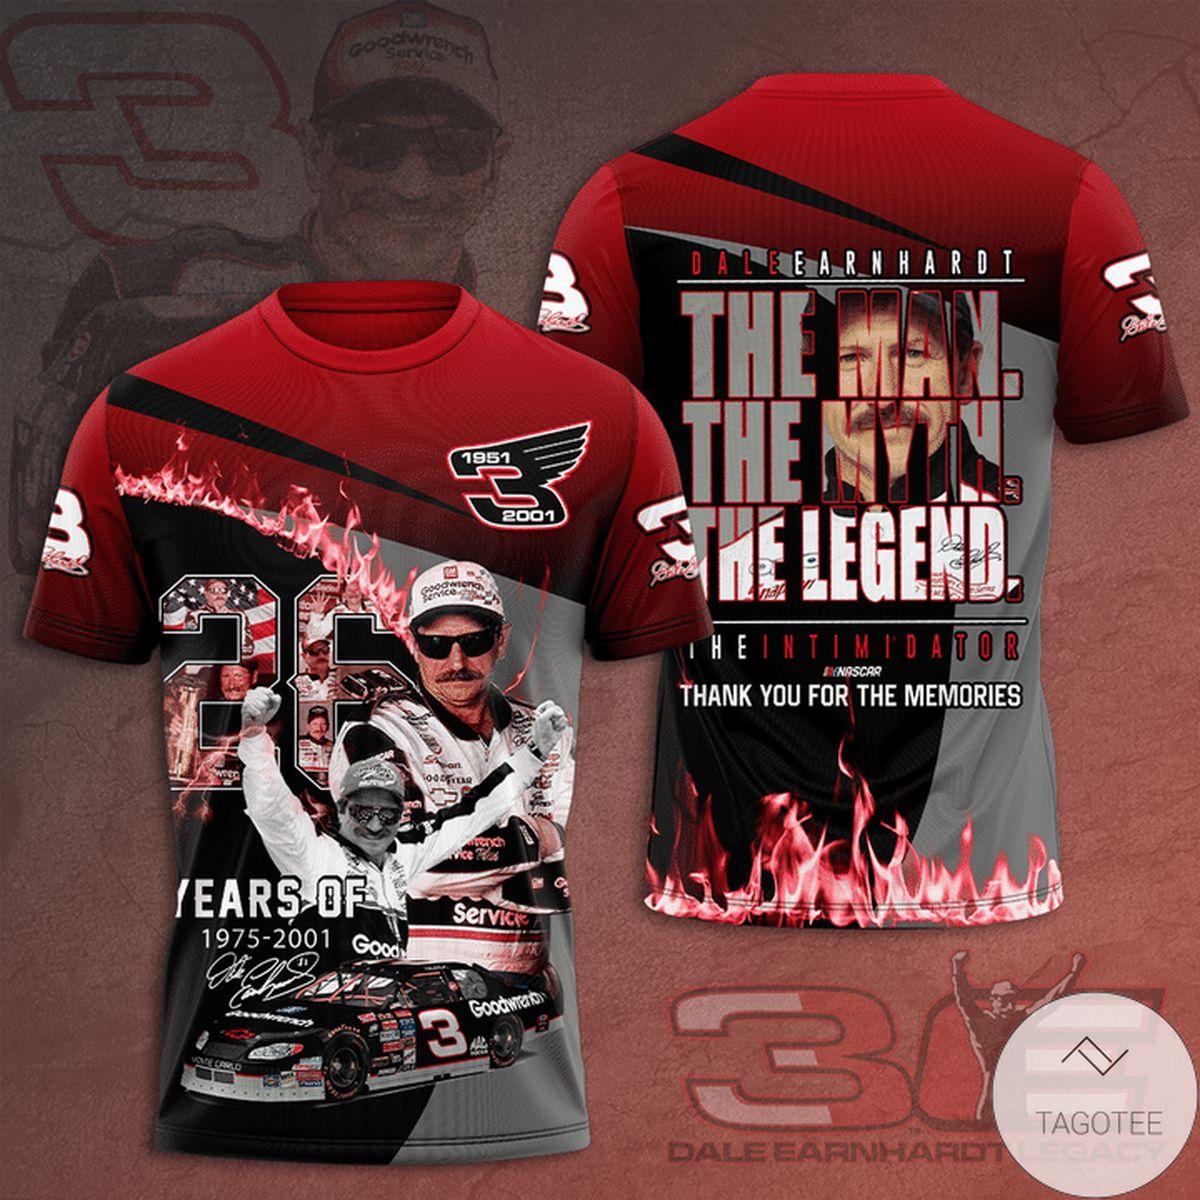 Dale Earnhardt The Man The Myth The Legend 3d Shirt